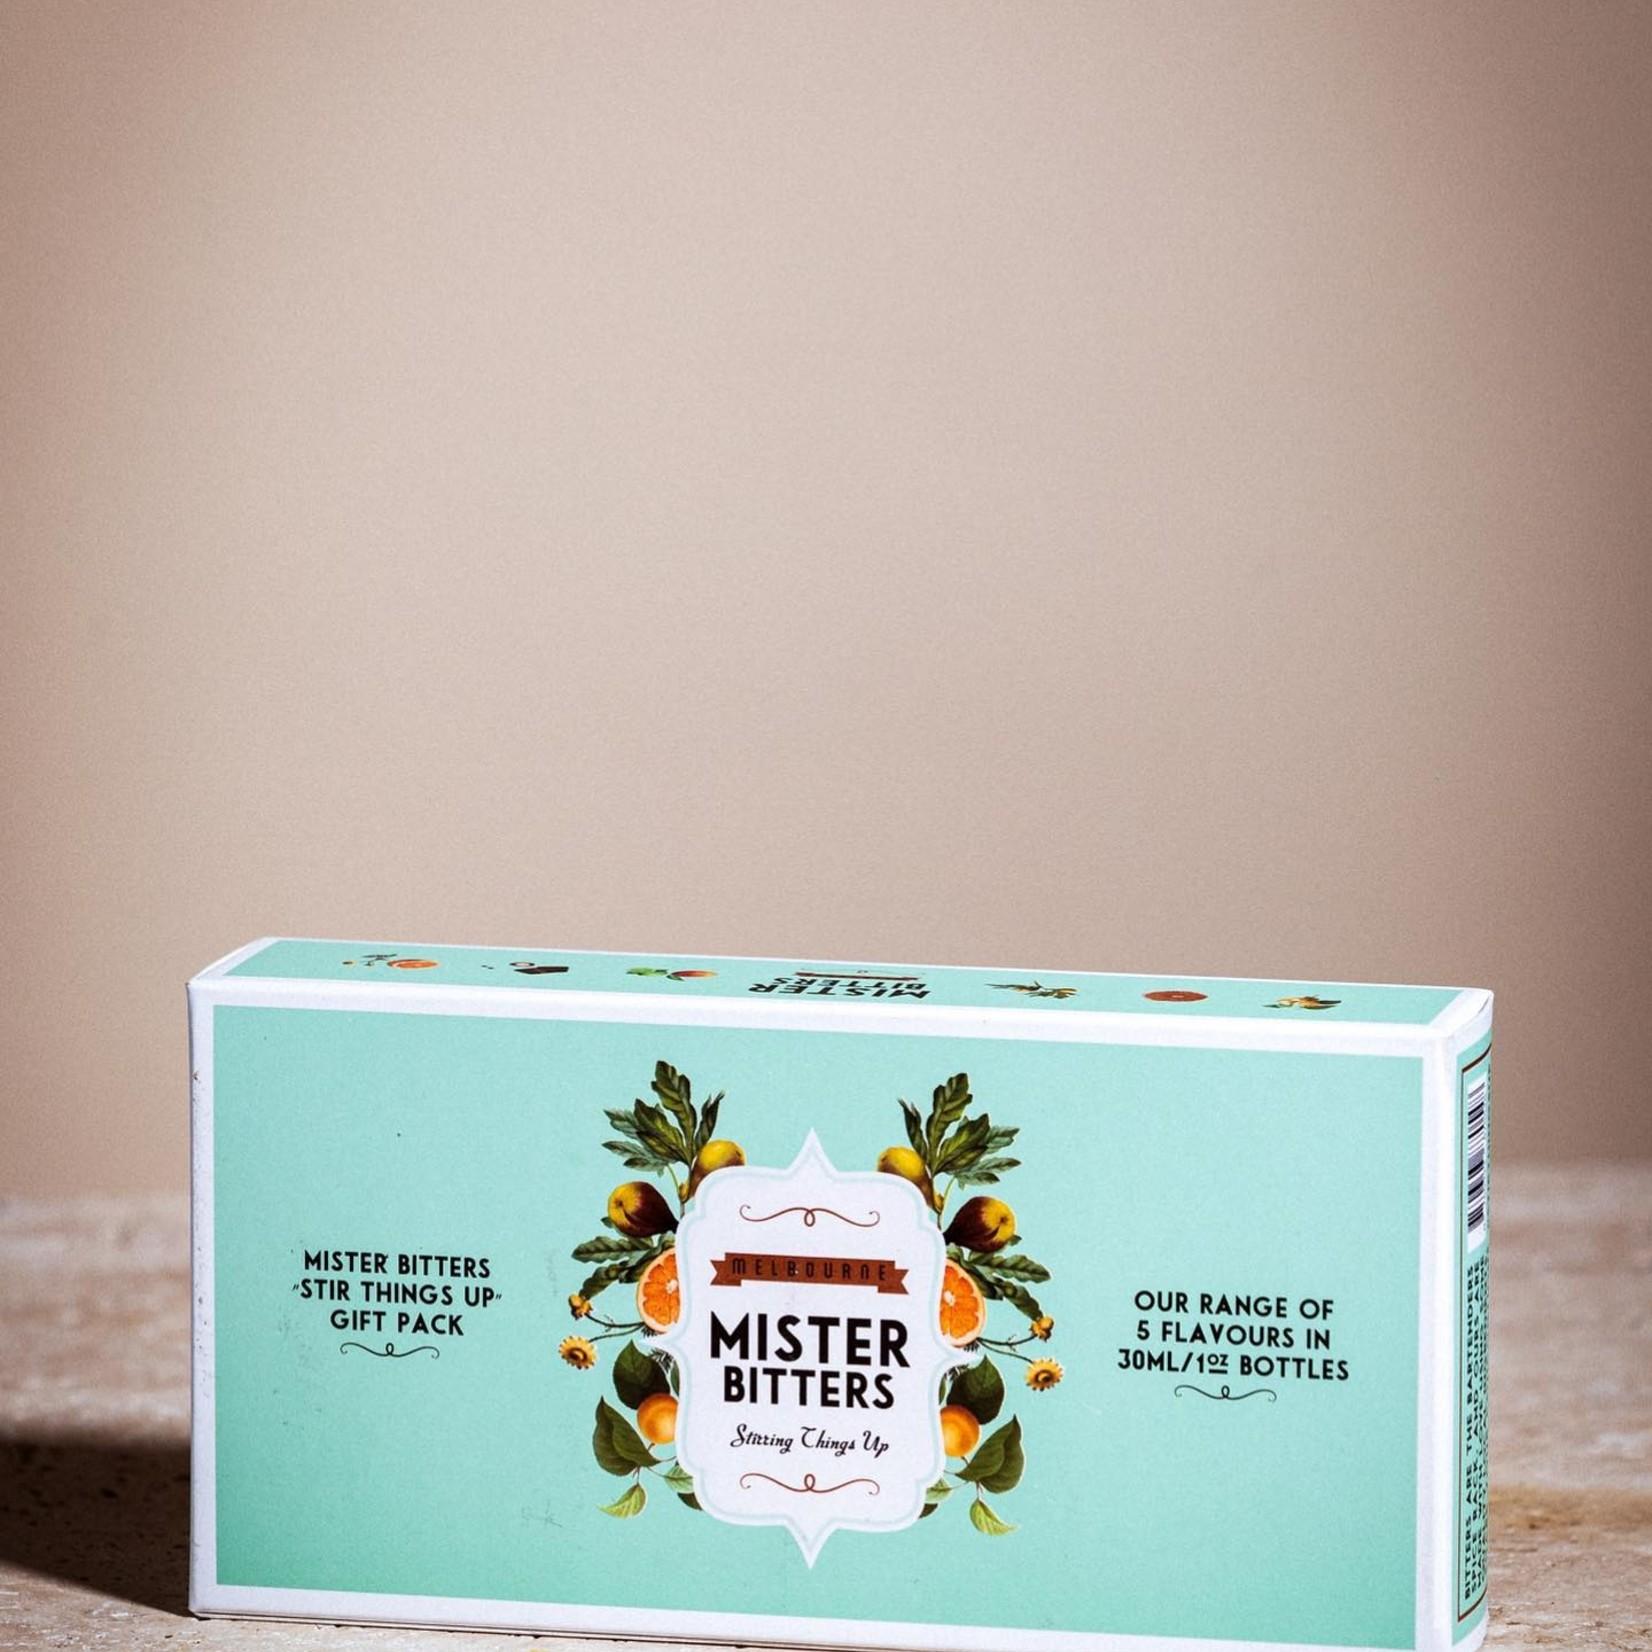 Mister Bitters Mister Bitters Gift Box